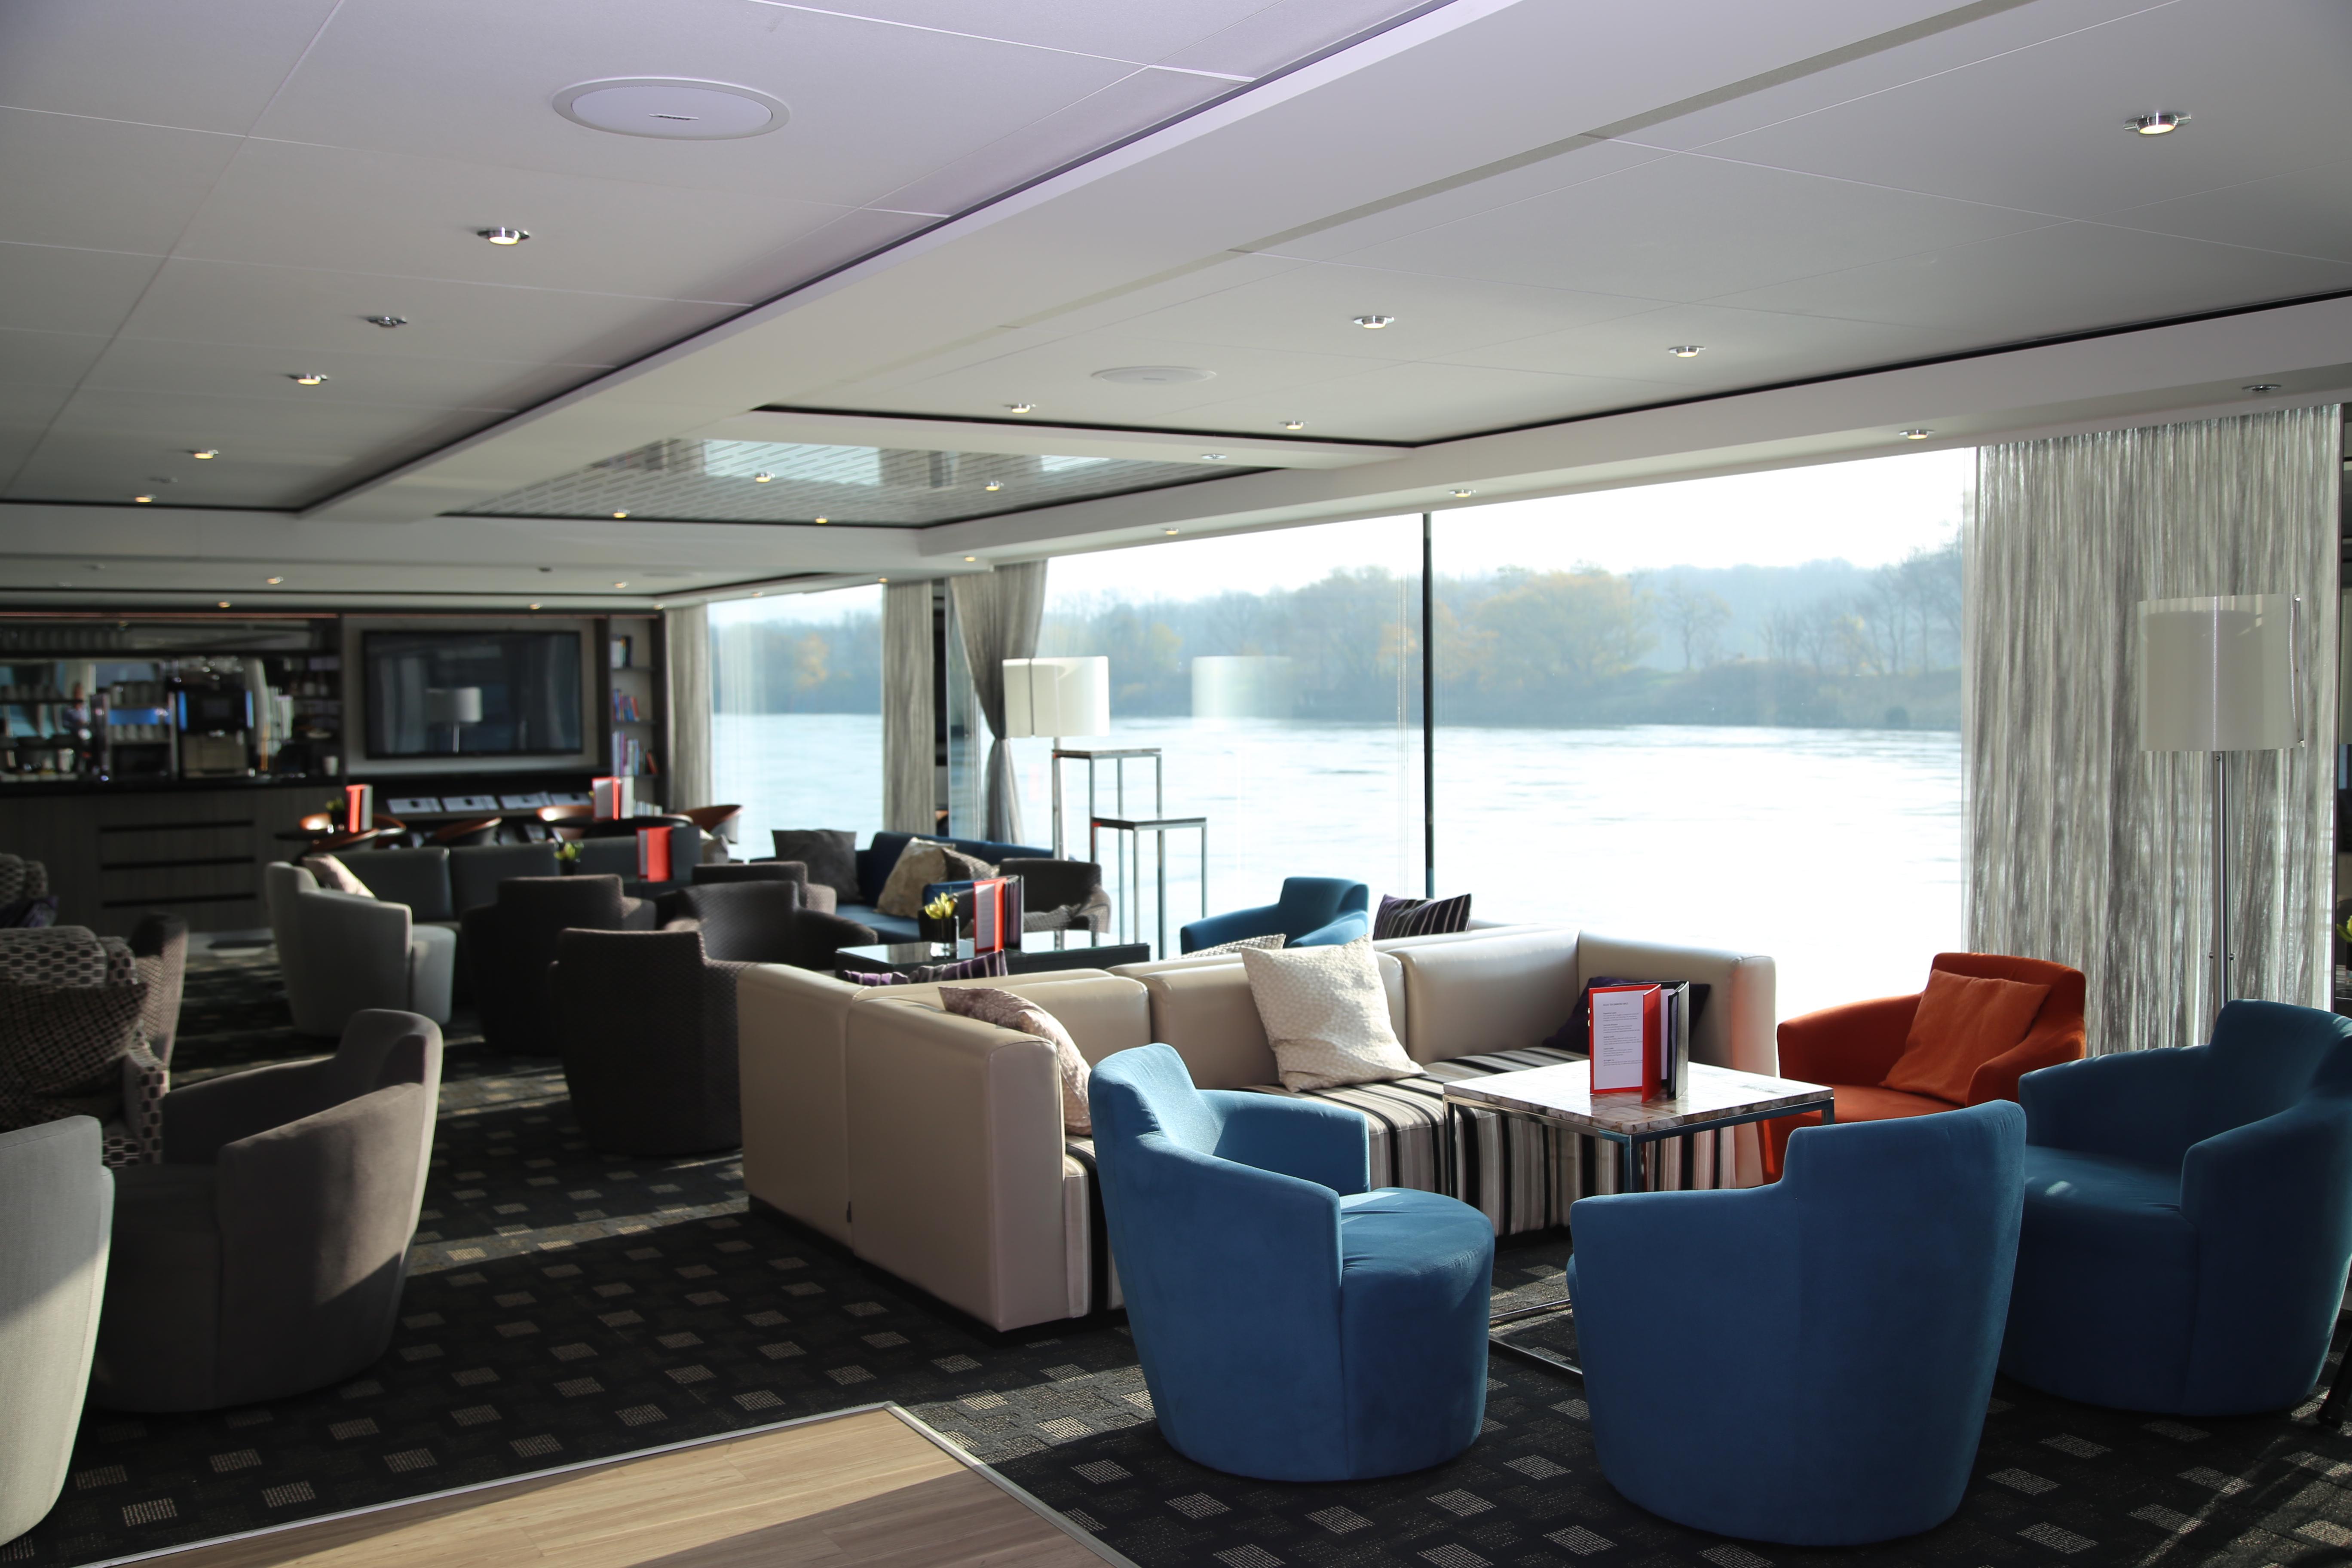 Scenic Crystal Scenic Jewel Scenic Jade Interior Panorama Lounge.JPG